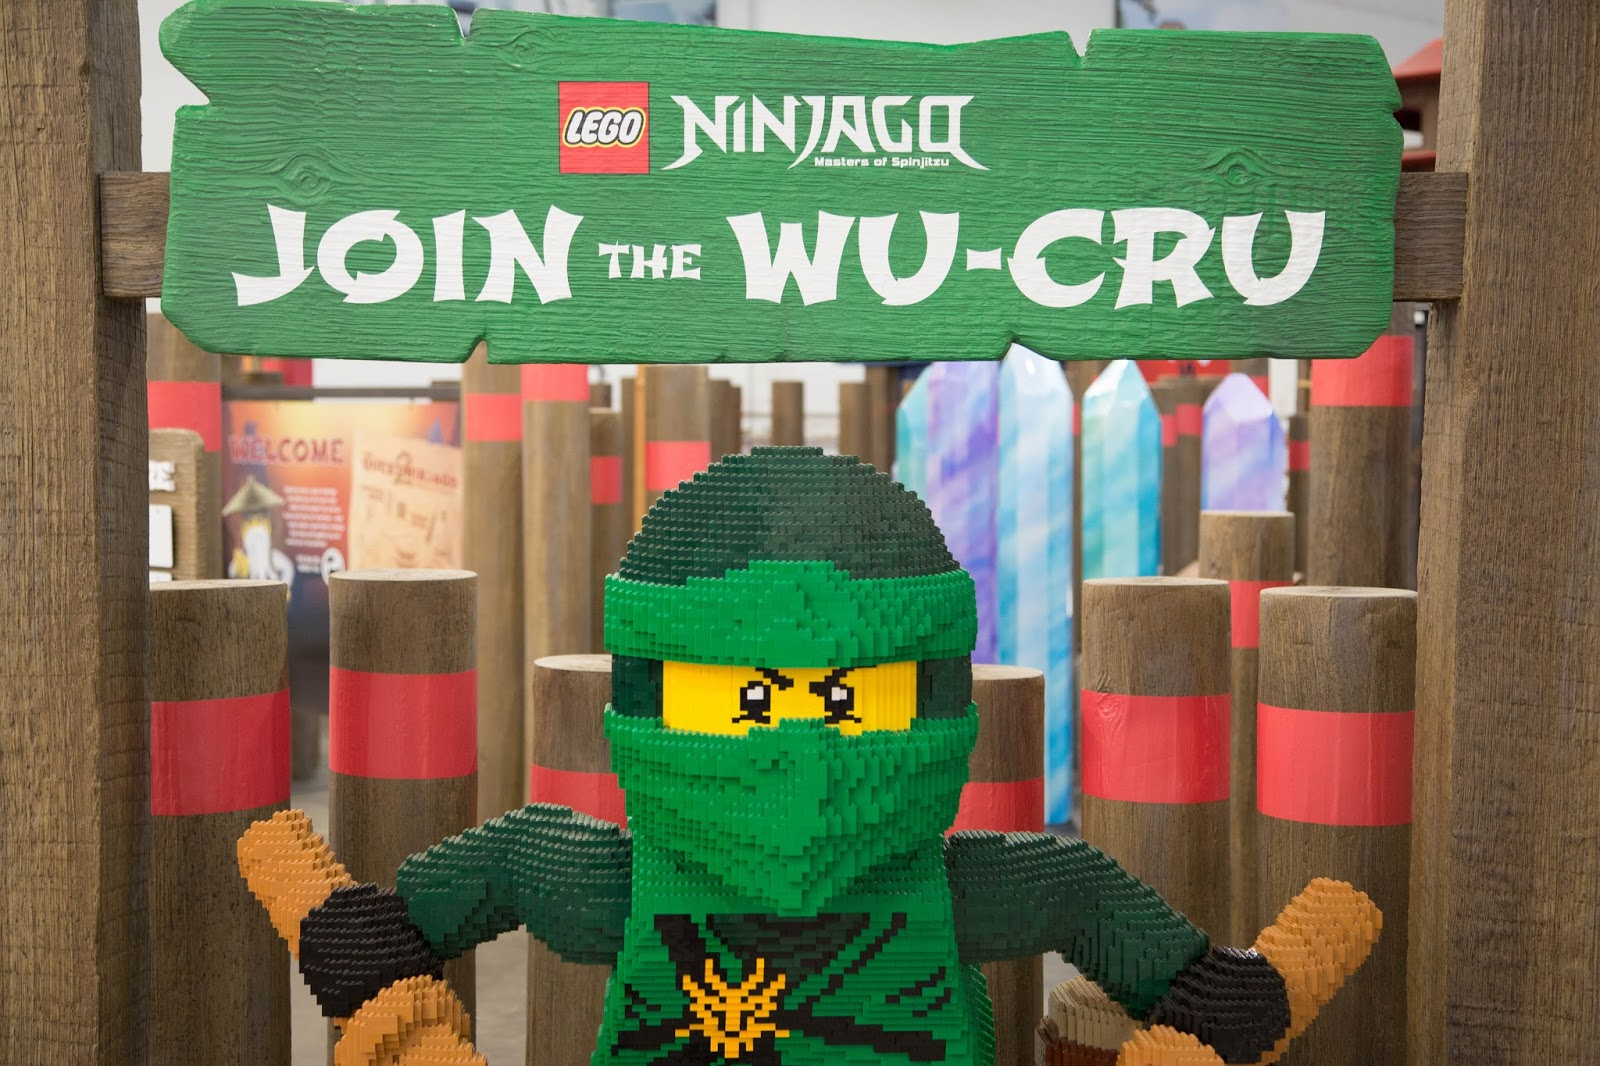 Free Lego Ninjago Quest2ninjago Wu Cru Team Challenge Mom About